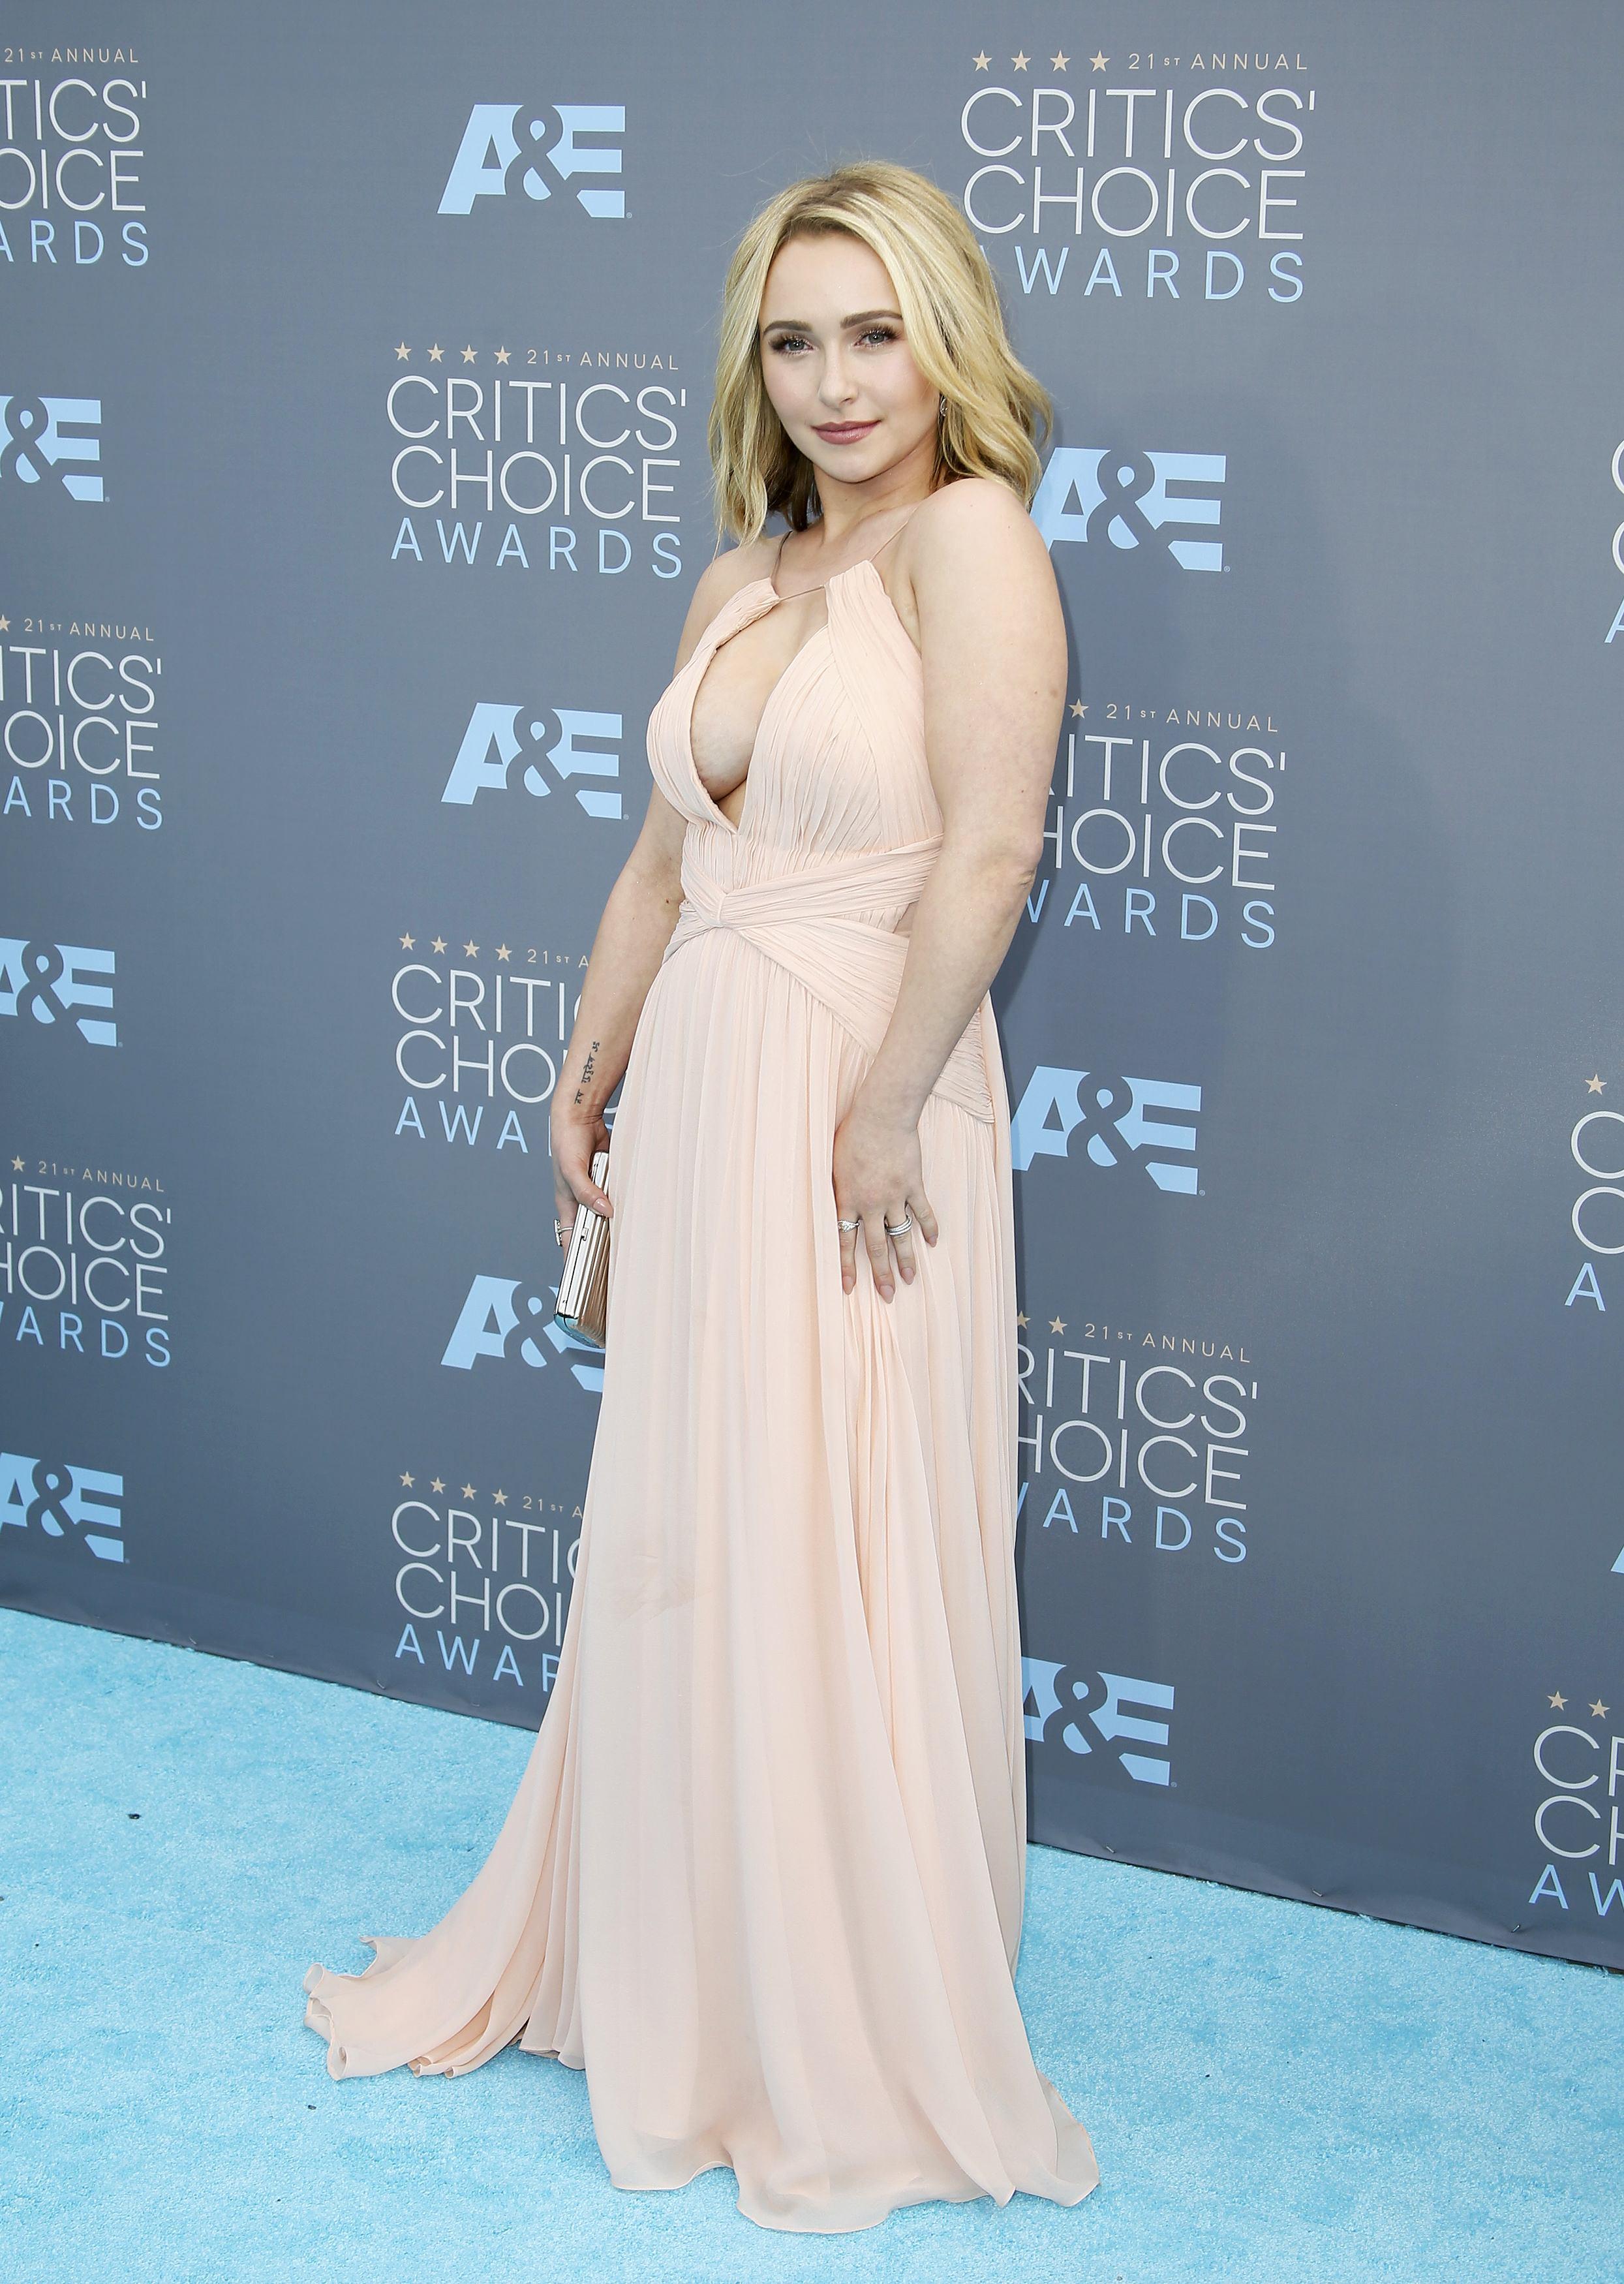 Hayden Panettiere 2016 : Hayden Panettiere: 2016 Critics Choice Awards -10